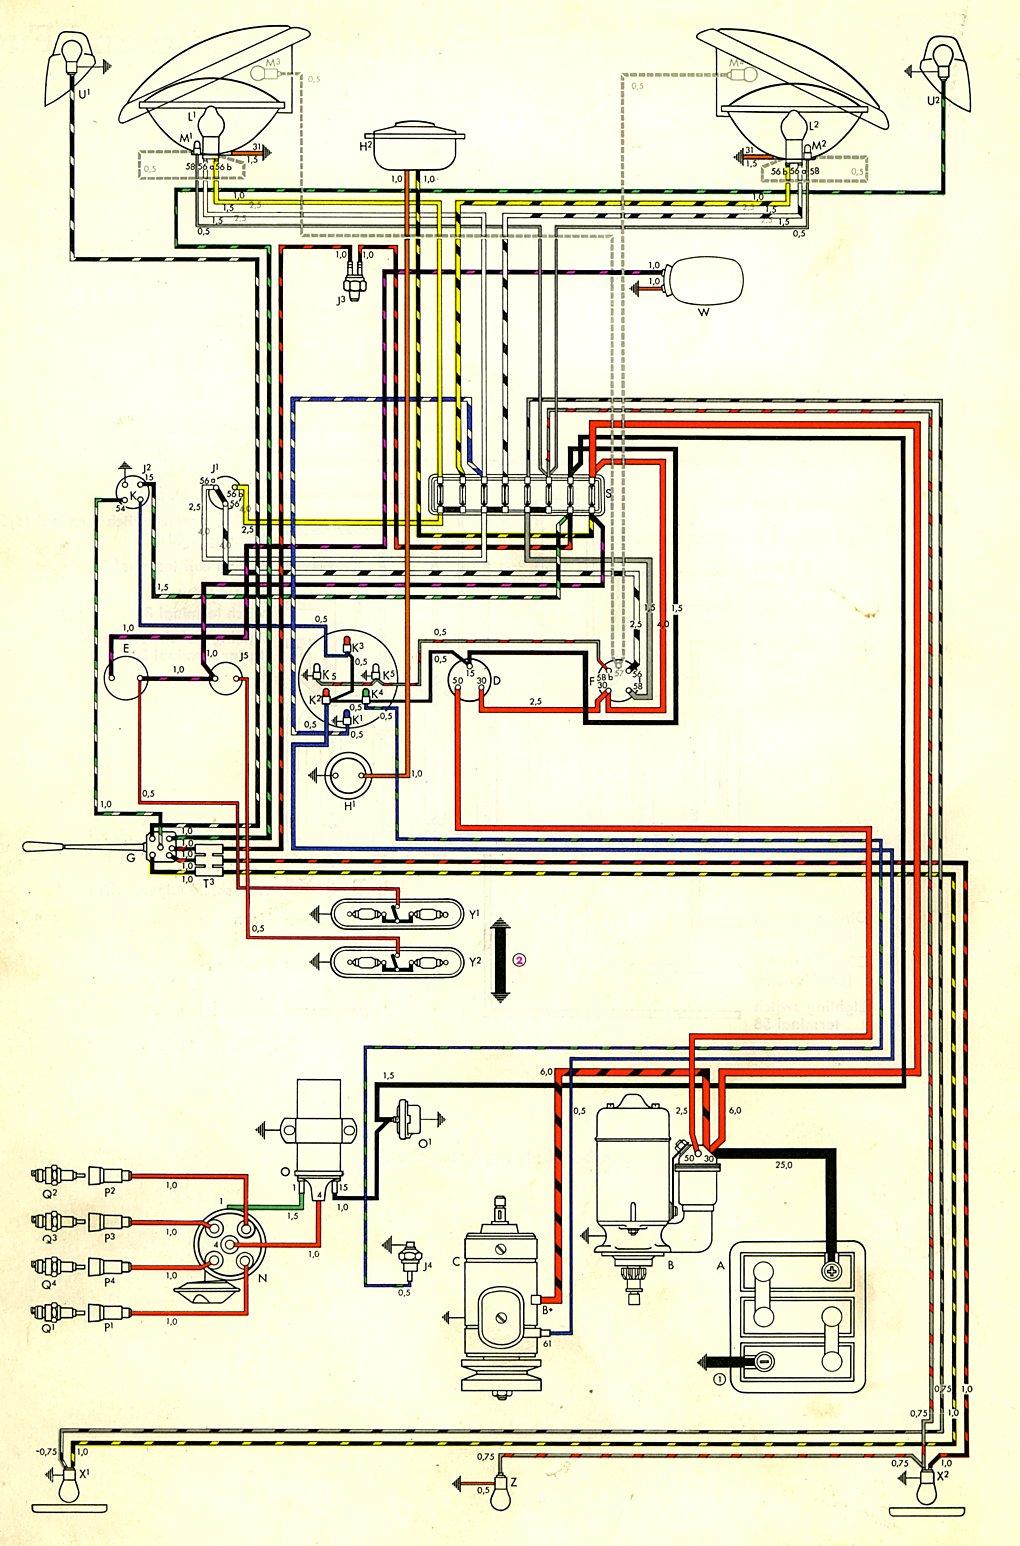 [DIAGRAM_38ZD]  DF_7949] Volkswagen Bus Engine Diagram Wiring Diagram | Vw Bus Engine Diagram With Wheelie Bar |  | Coun Penghe Ilari Gresi Chro Carn Ospor Garna Grebs Unho Rele  Mohammedshrine Librar Wiring 101